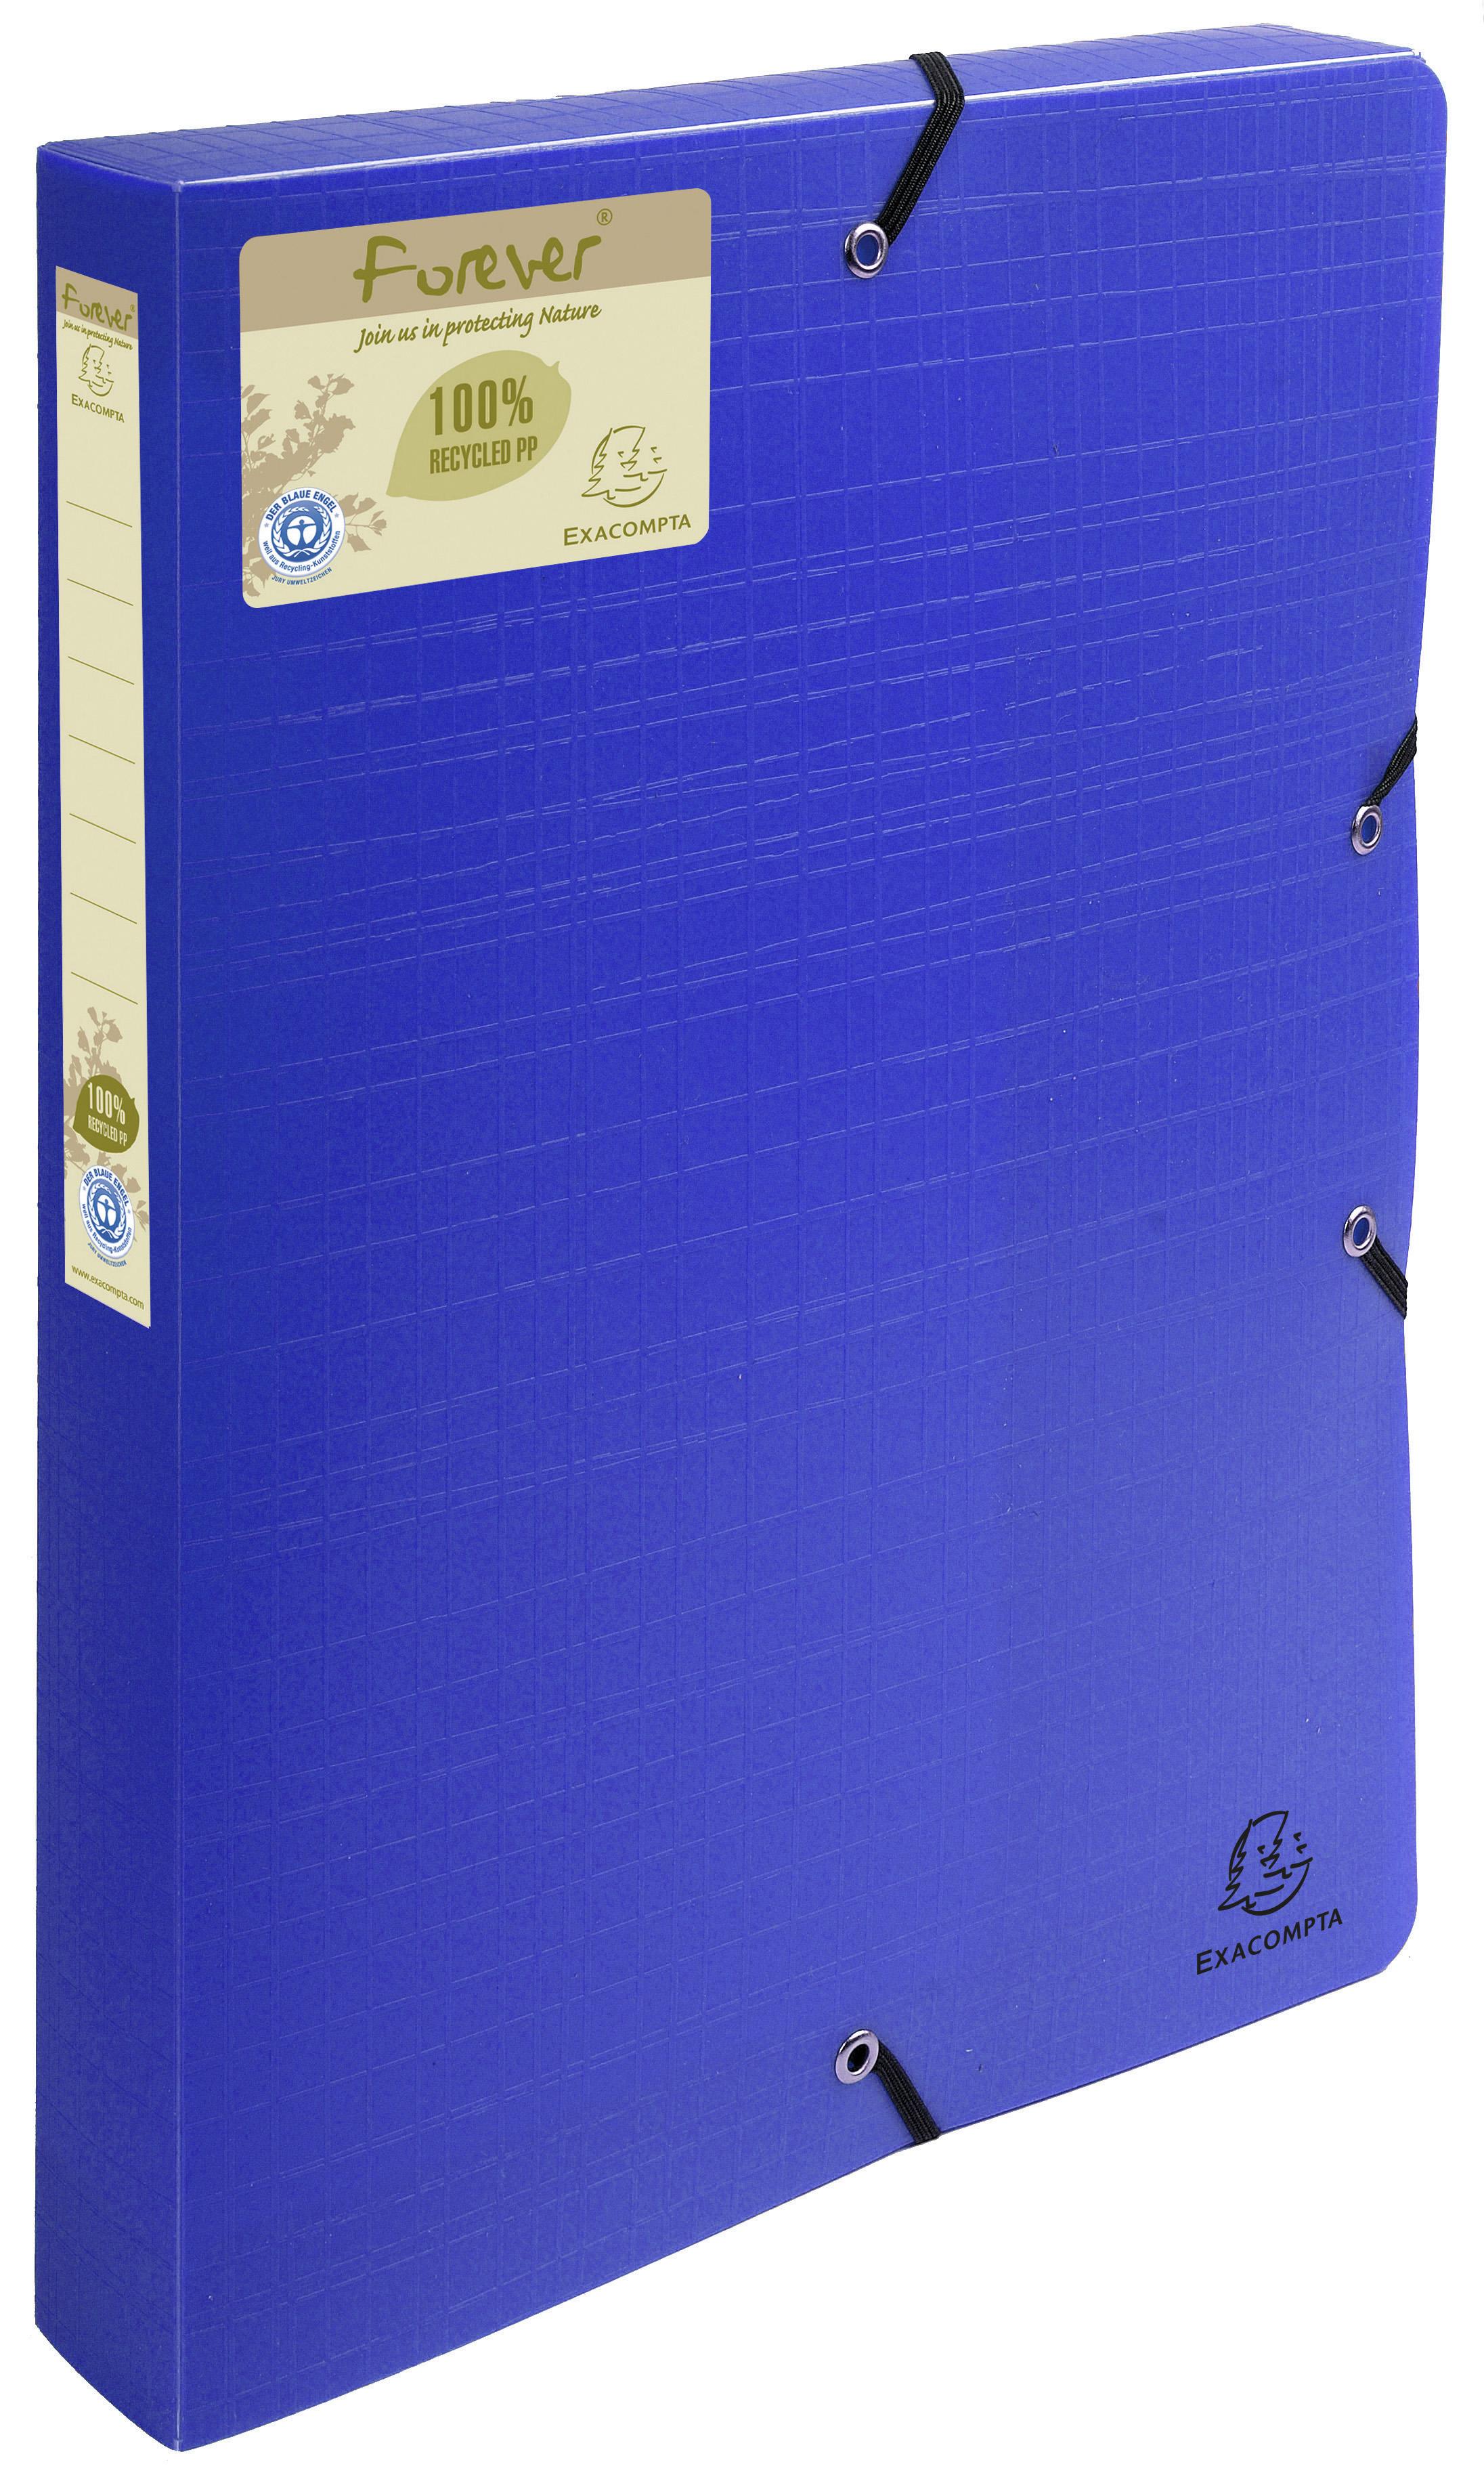 Box Files Forever Box File Elastic Closure A4 40mm PP Blue PK8